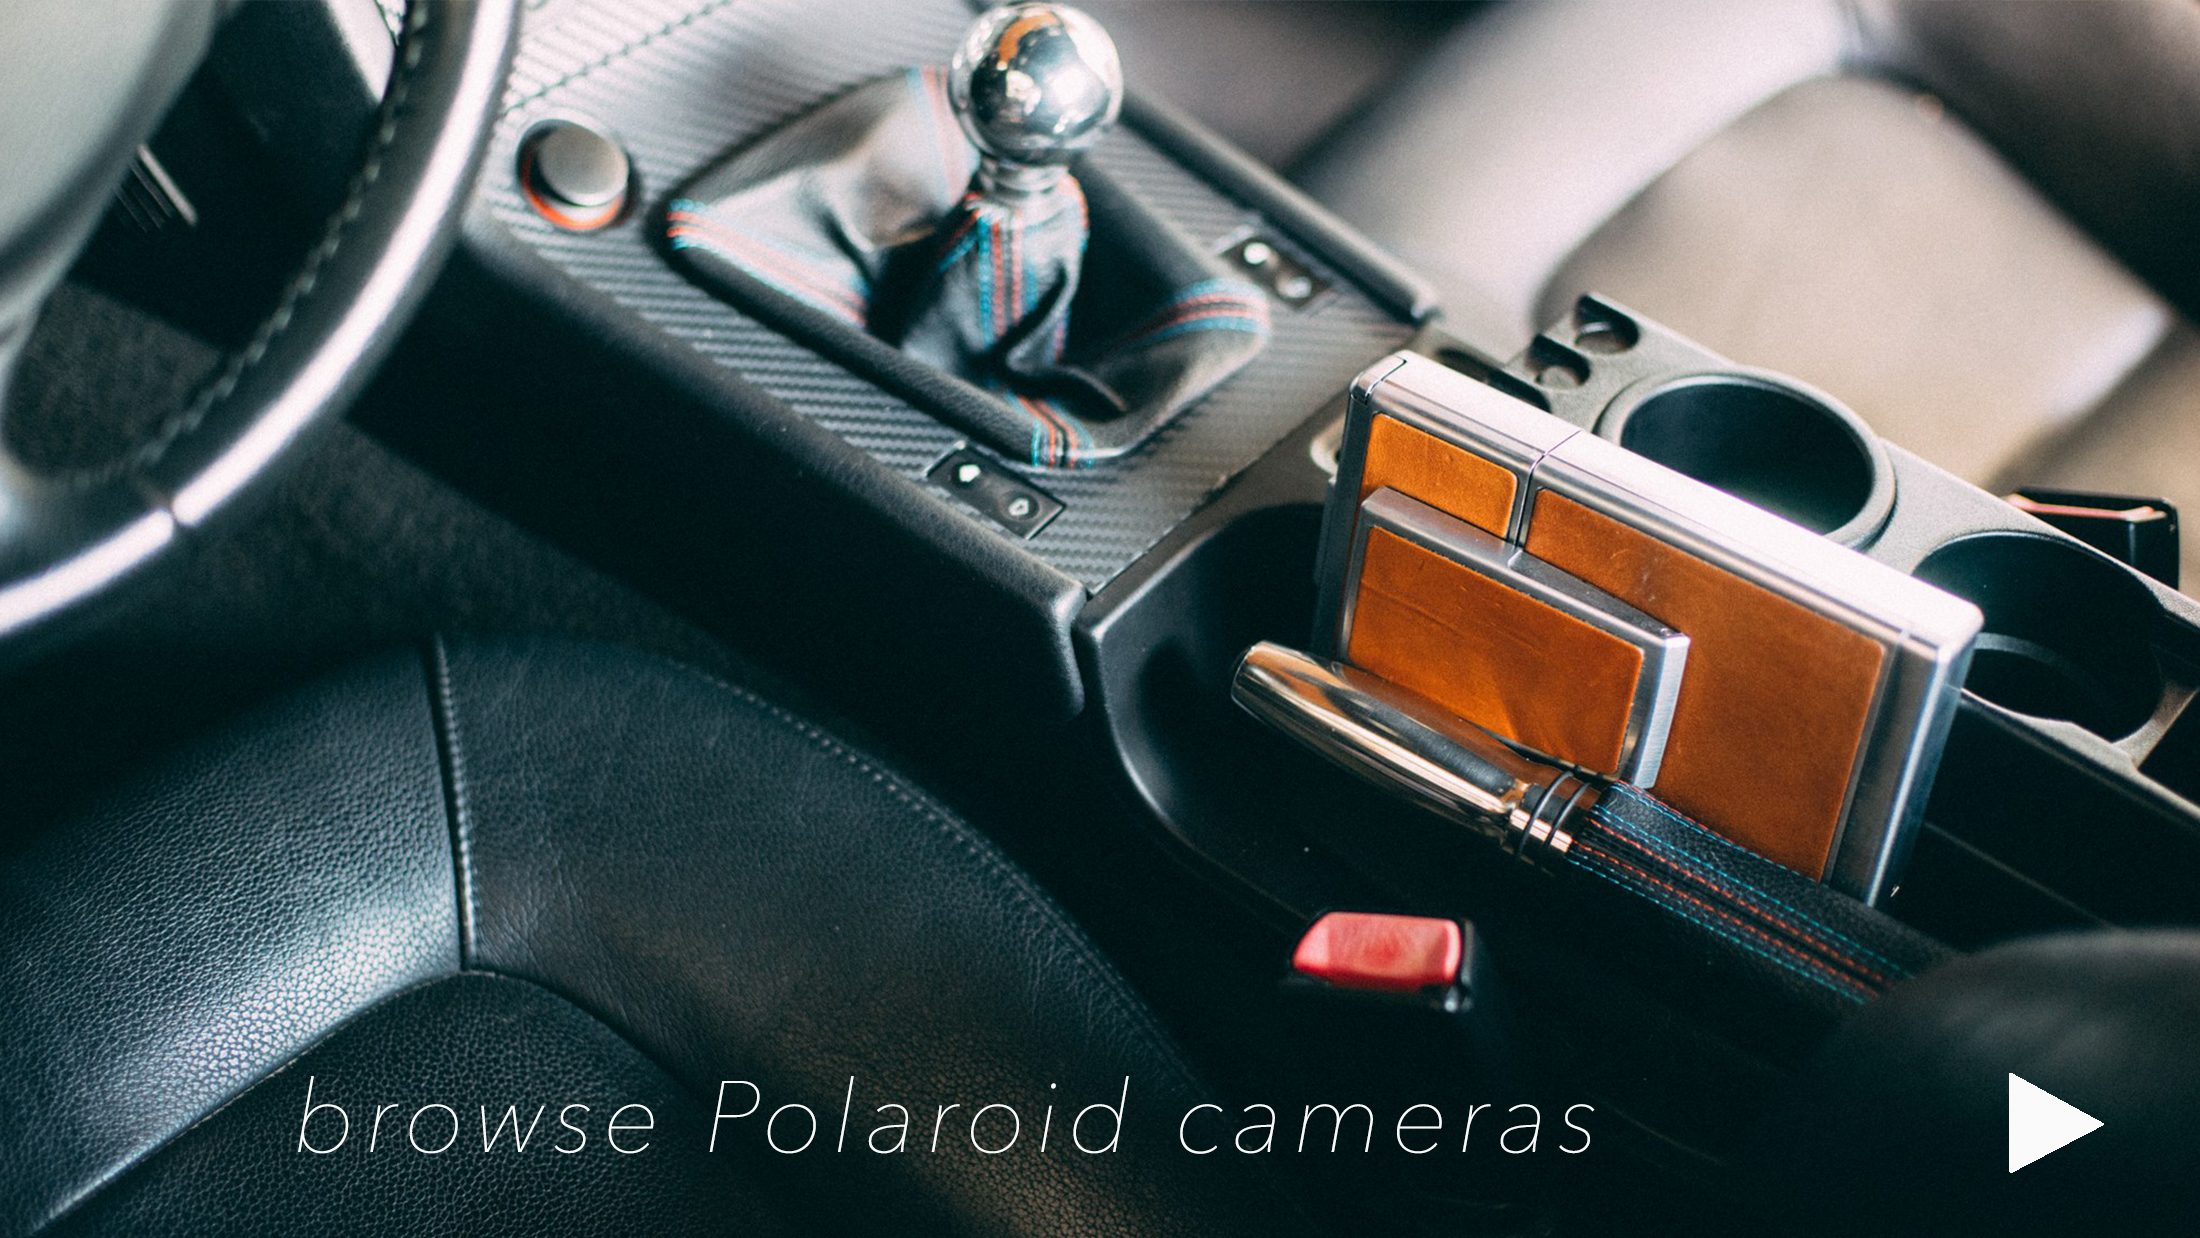 Polaroid cameras for sale.jpg